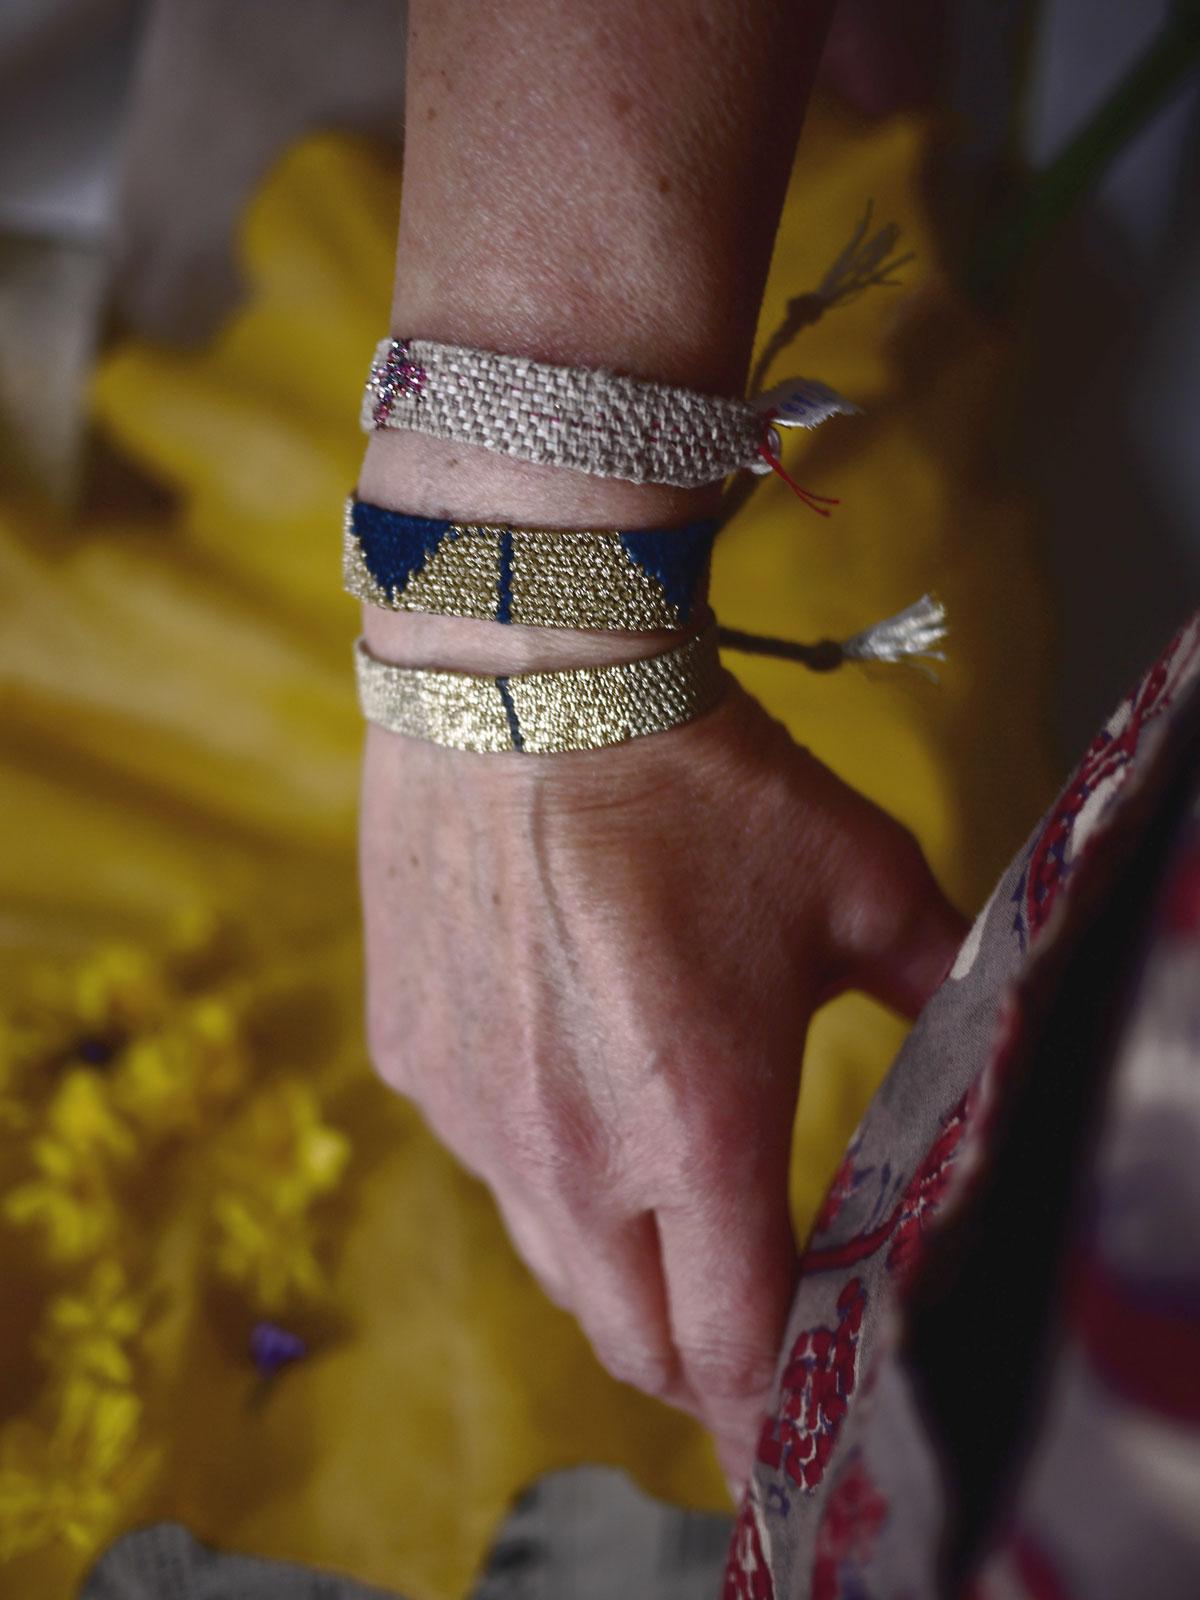 Bracelets LOOM - Design textile by Myriam Balaÿ myriam-balay-avril VUE d' ATELIER L'appartement